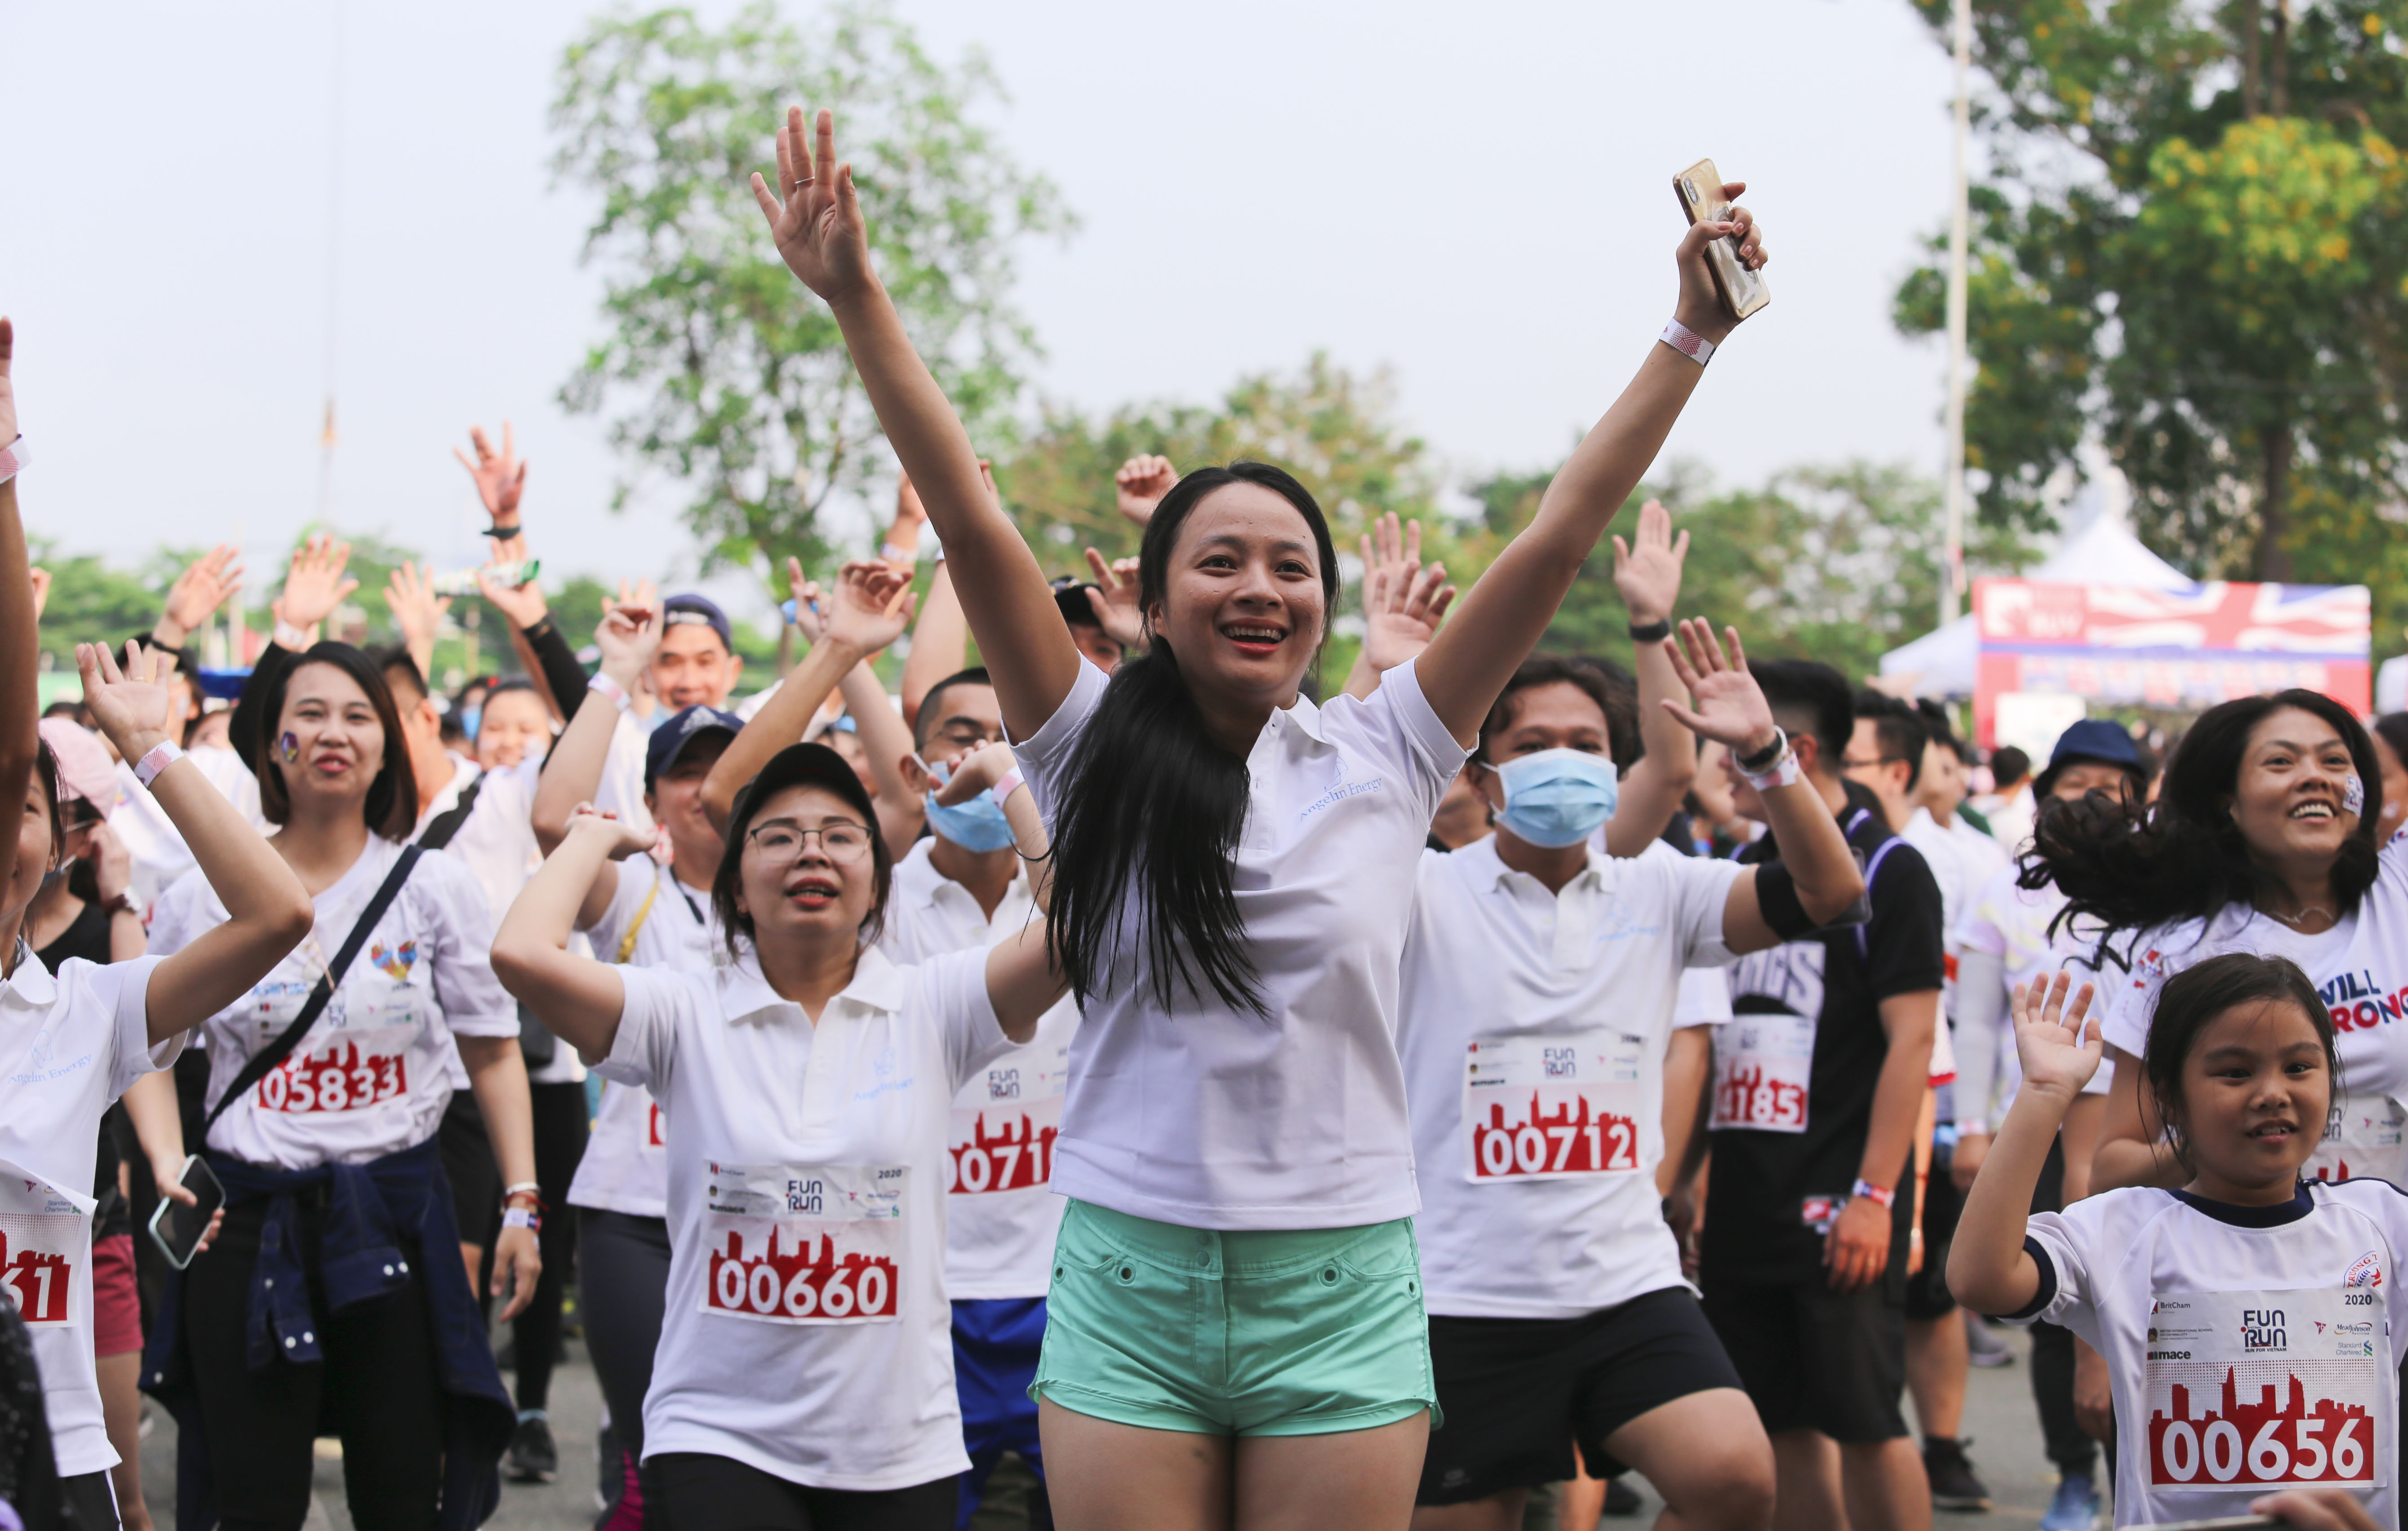 BritCham Fun Run raises $47,600 to help needy people in Vietnam